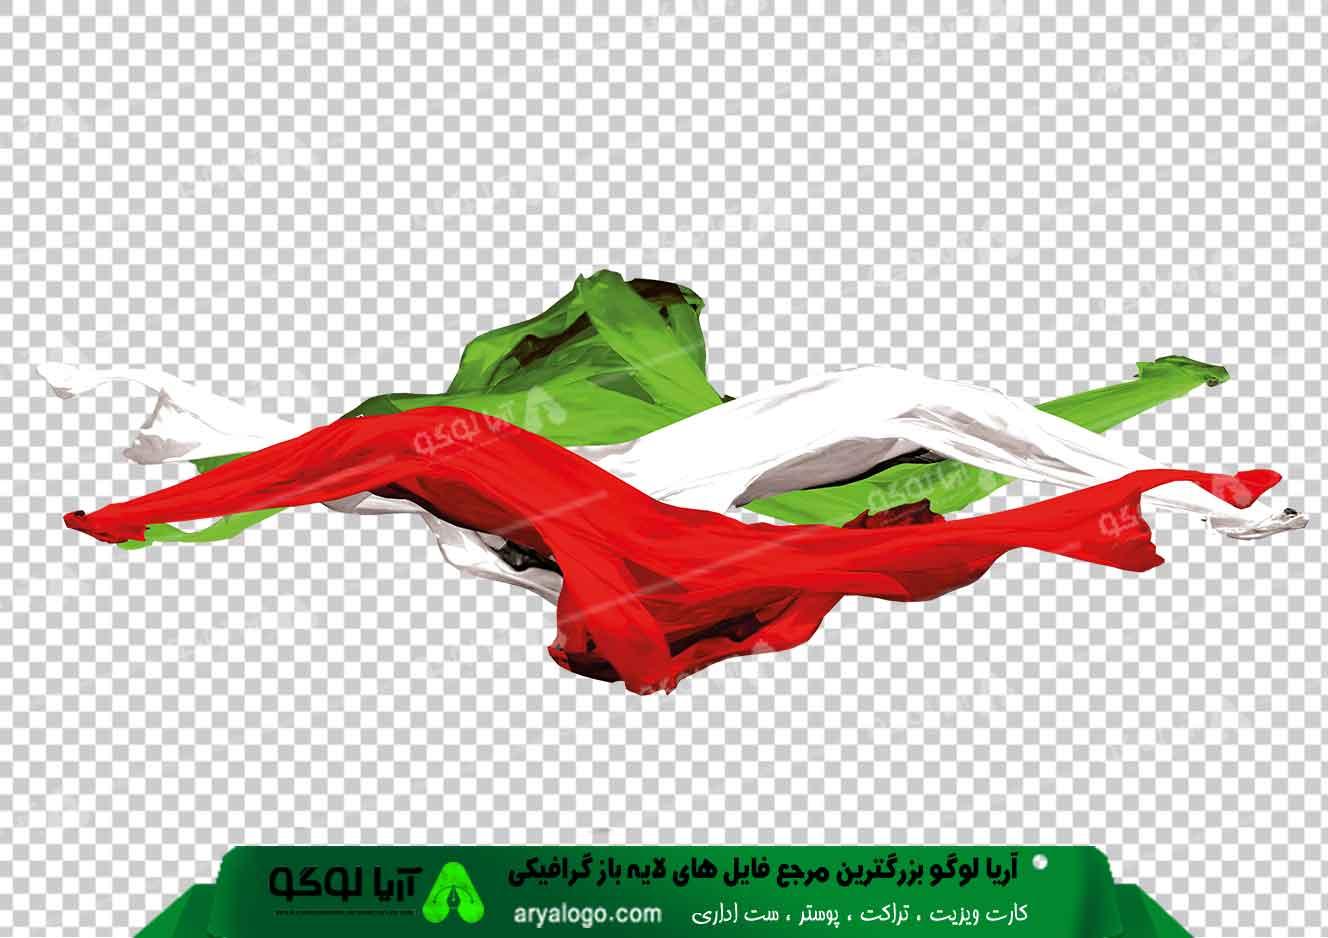 وکتور png پرچم ایران 18